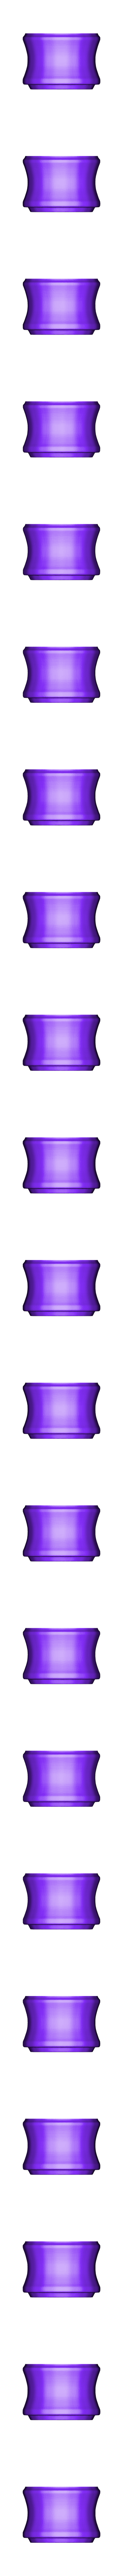 middle_p1.stl Download free STL file Mini Holder V2 • 3D printable model, HeribertoValle